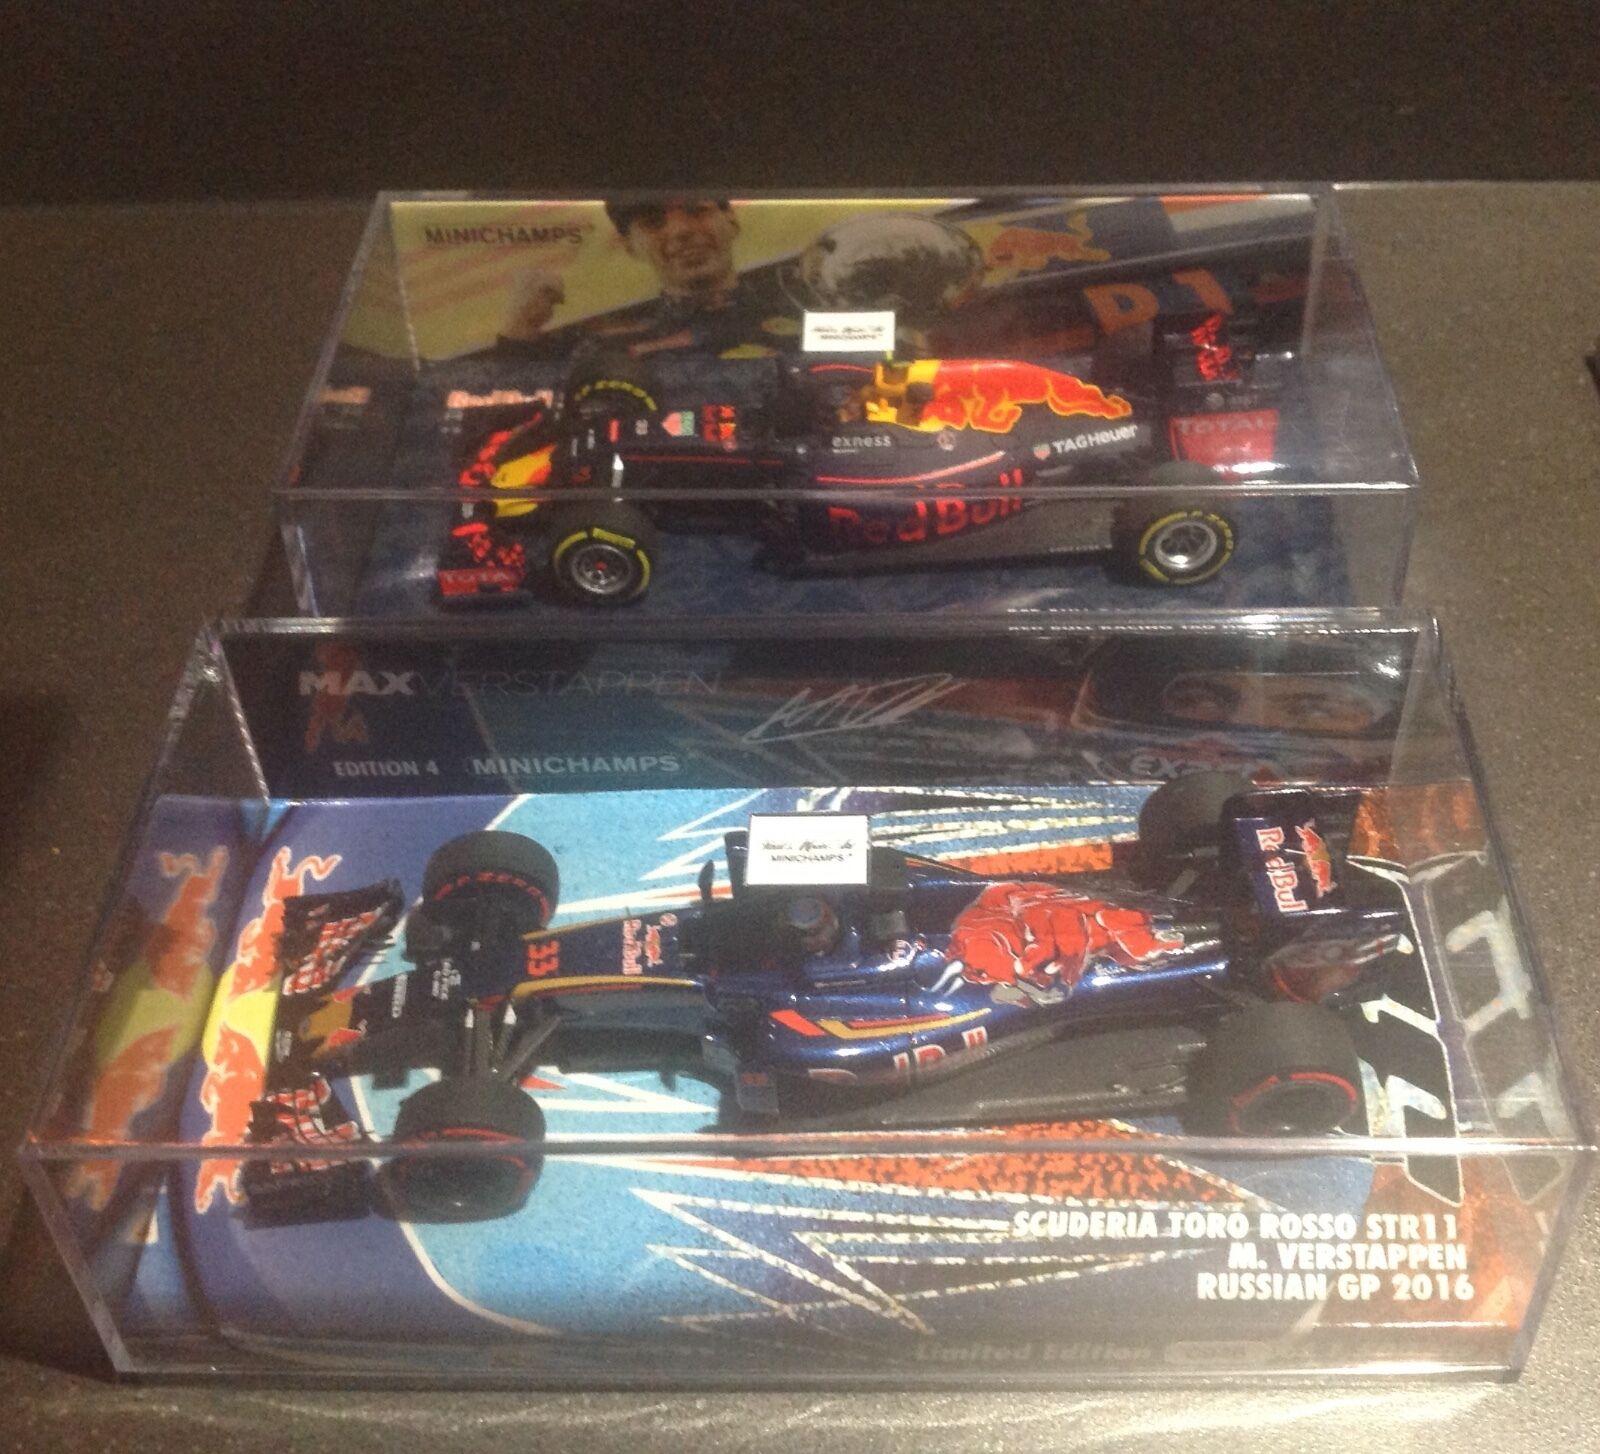 Minichamps 1 43 Max Verstappen edition 4 Russia & First WIN Spanish GP Ltd ed.